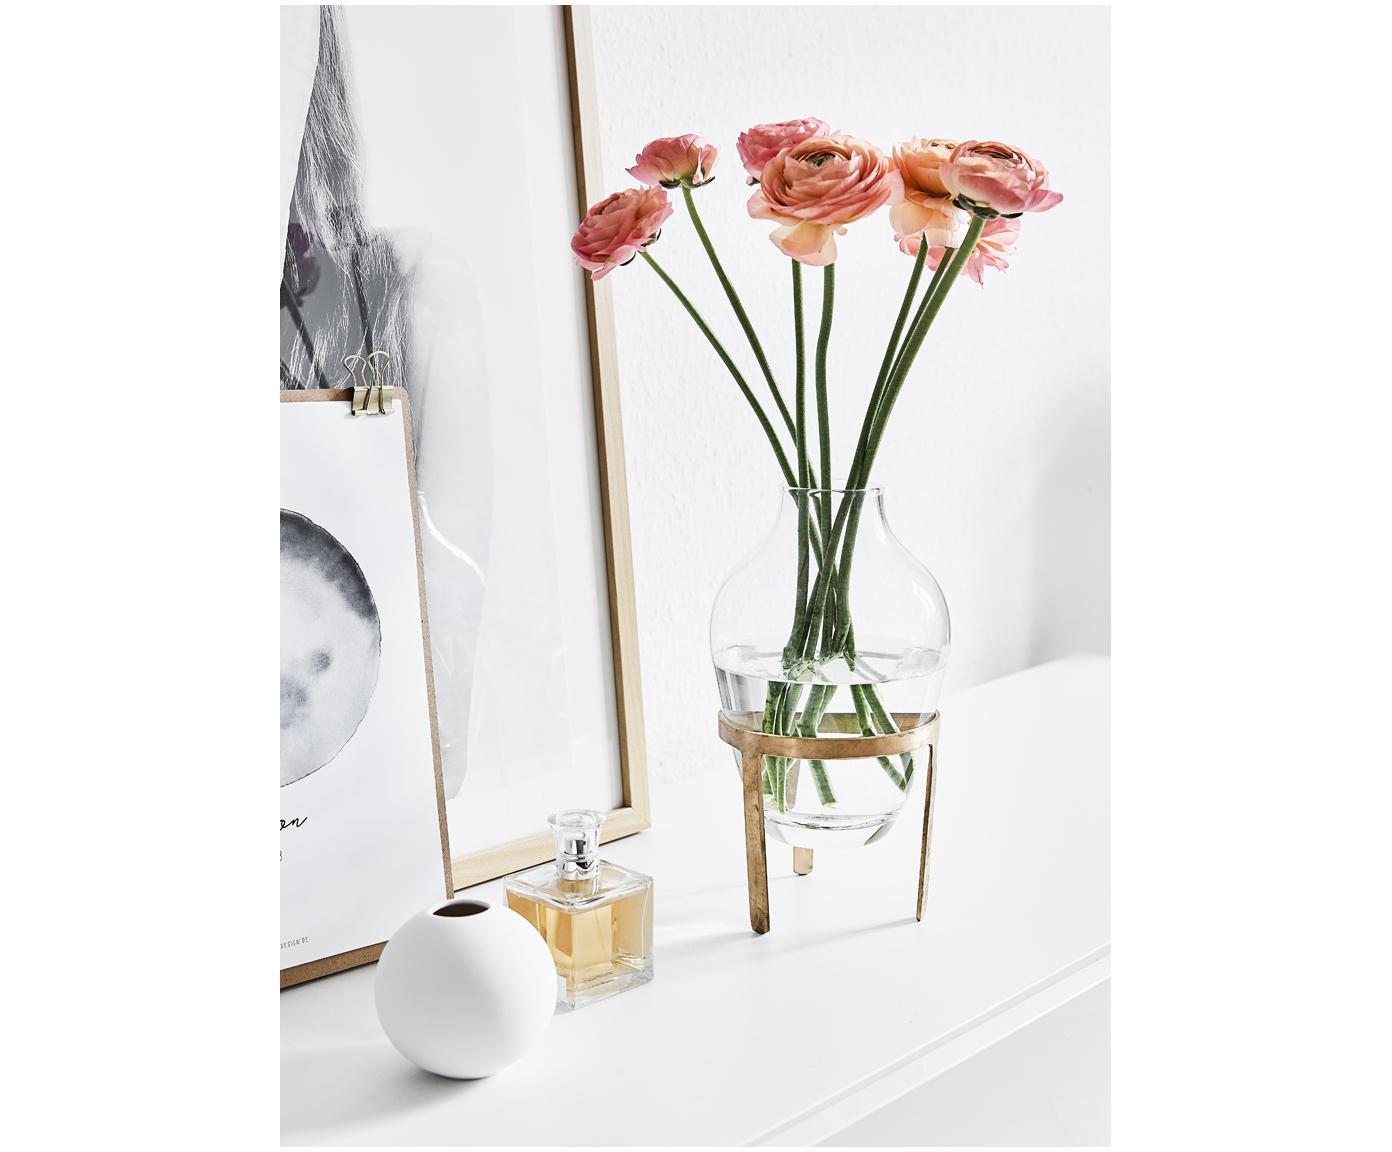 Vase Adorn, Gestell: Messing, Vase: Glas, Gestell: Messing, mattVase: Transparent, Ø 14 x H 27 cm